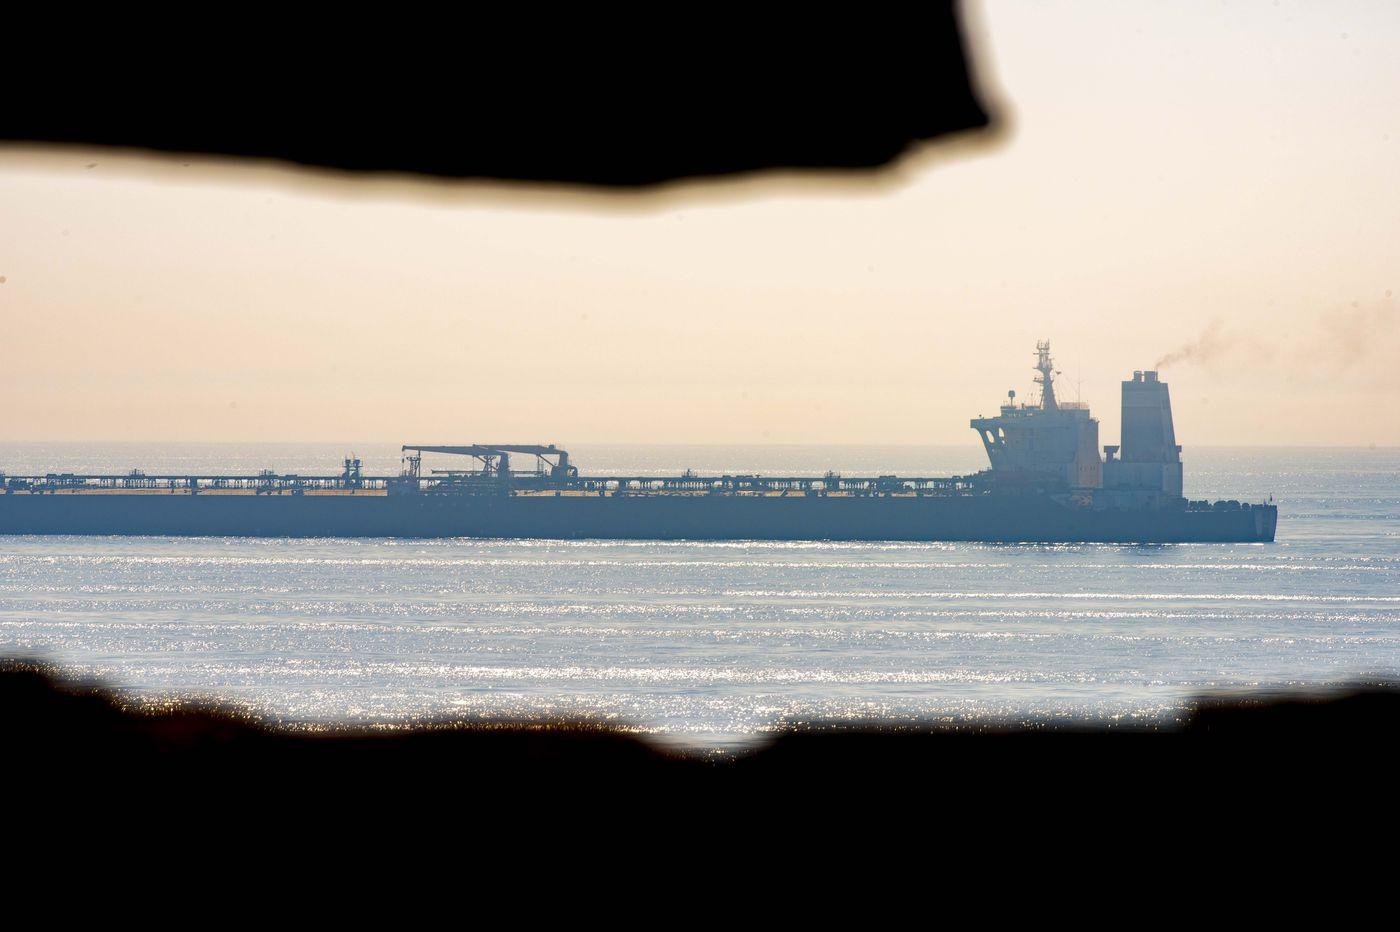 Iranian tanker to leave Gibraltar soon despite U.S. pressure